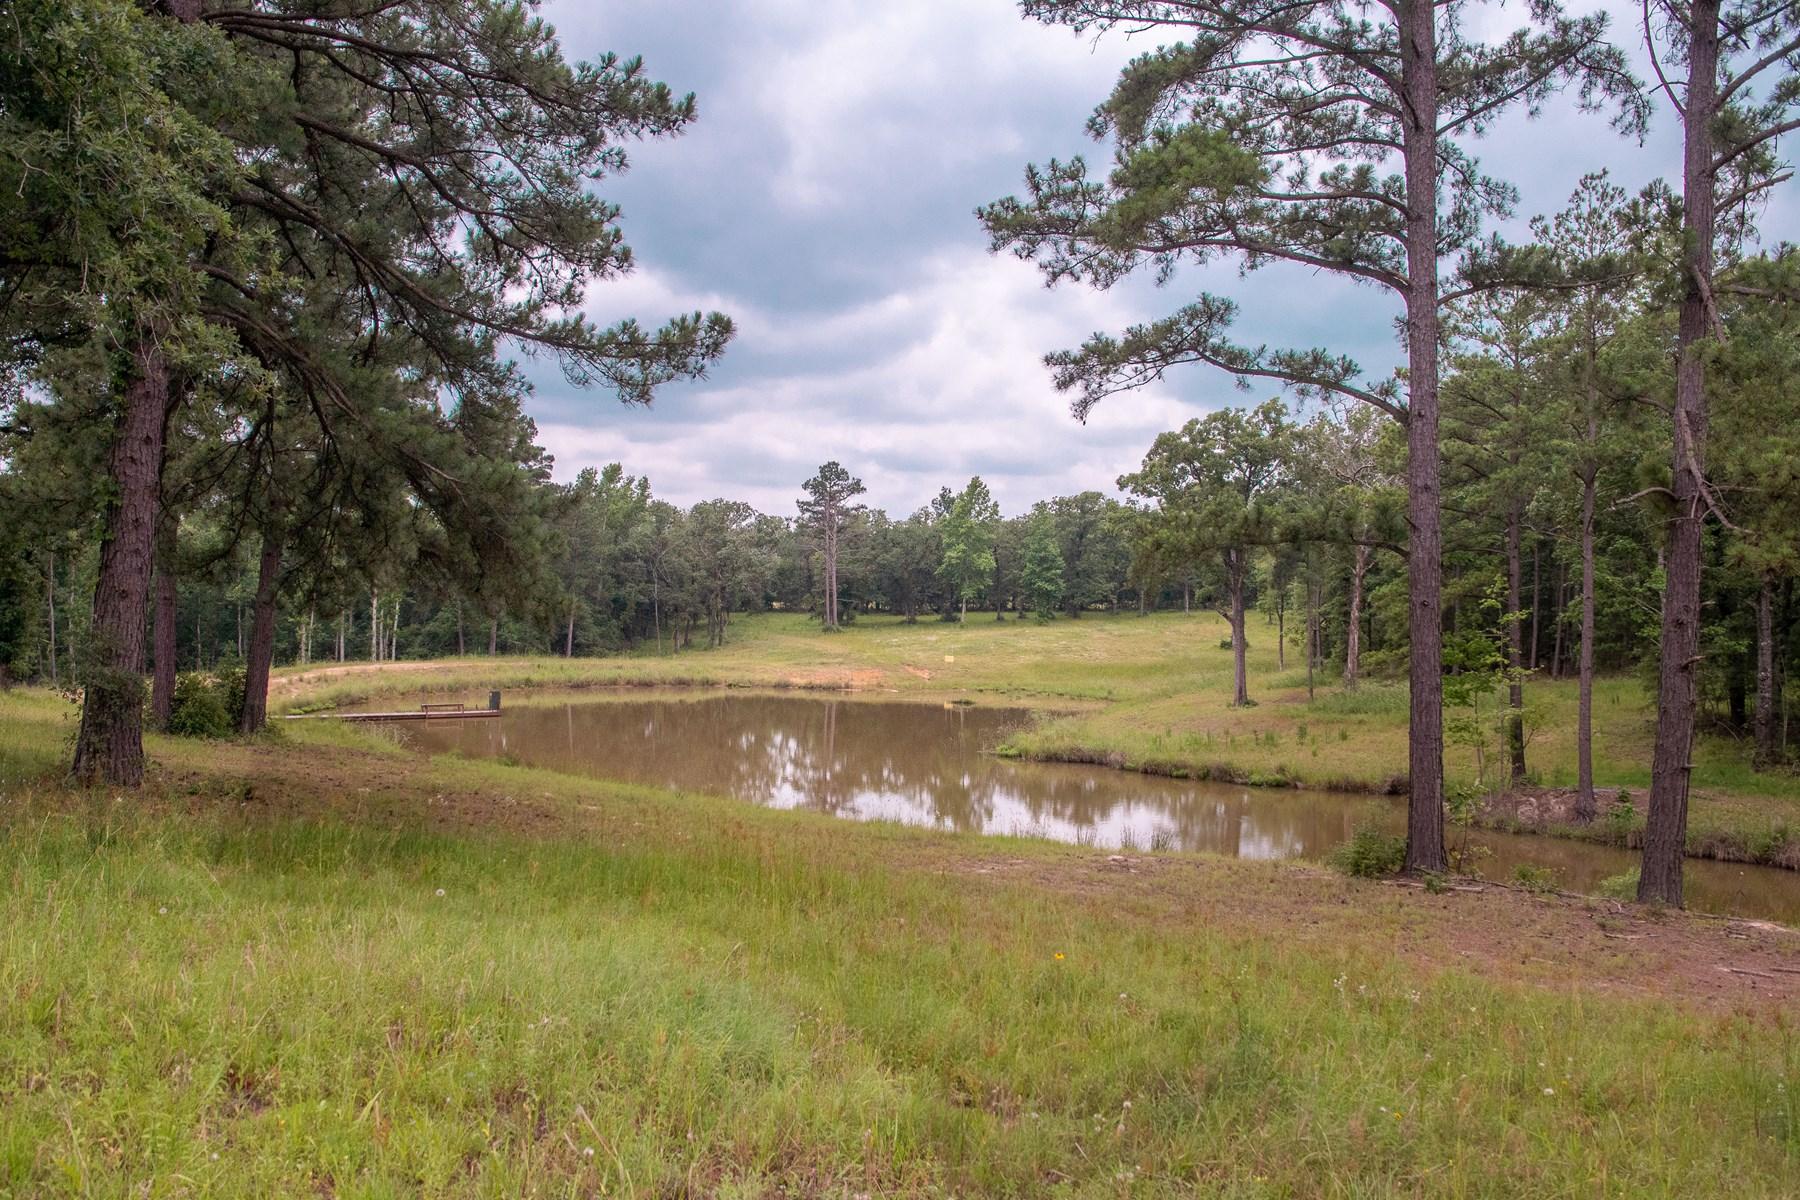 Land For Sale - 71 Acres - Near Oakwood - Leon County Texas